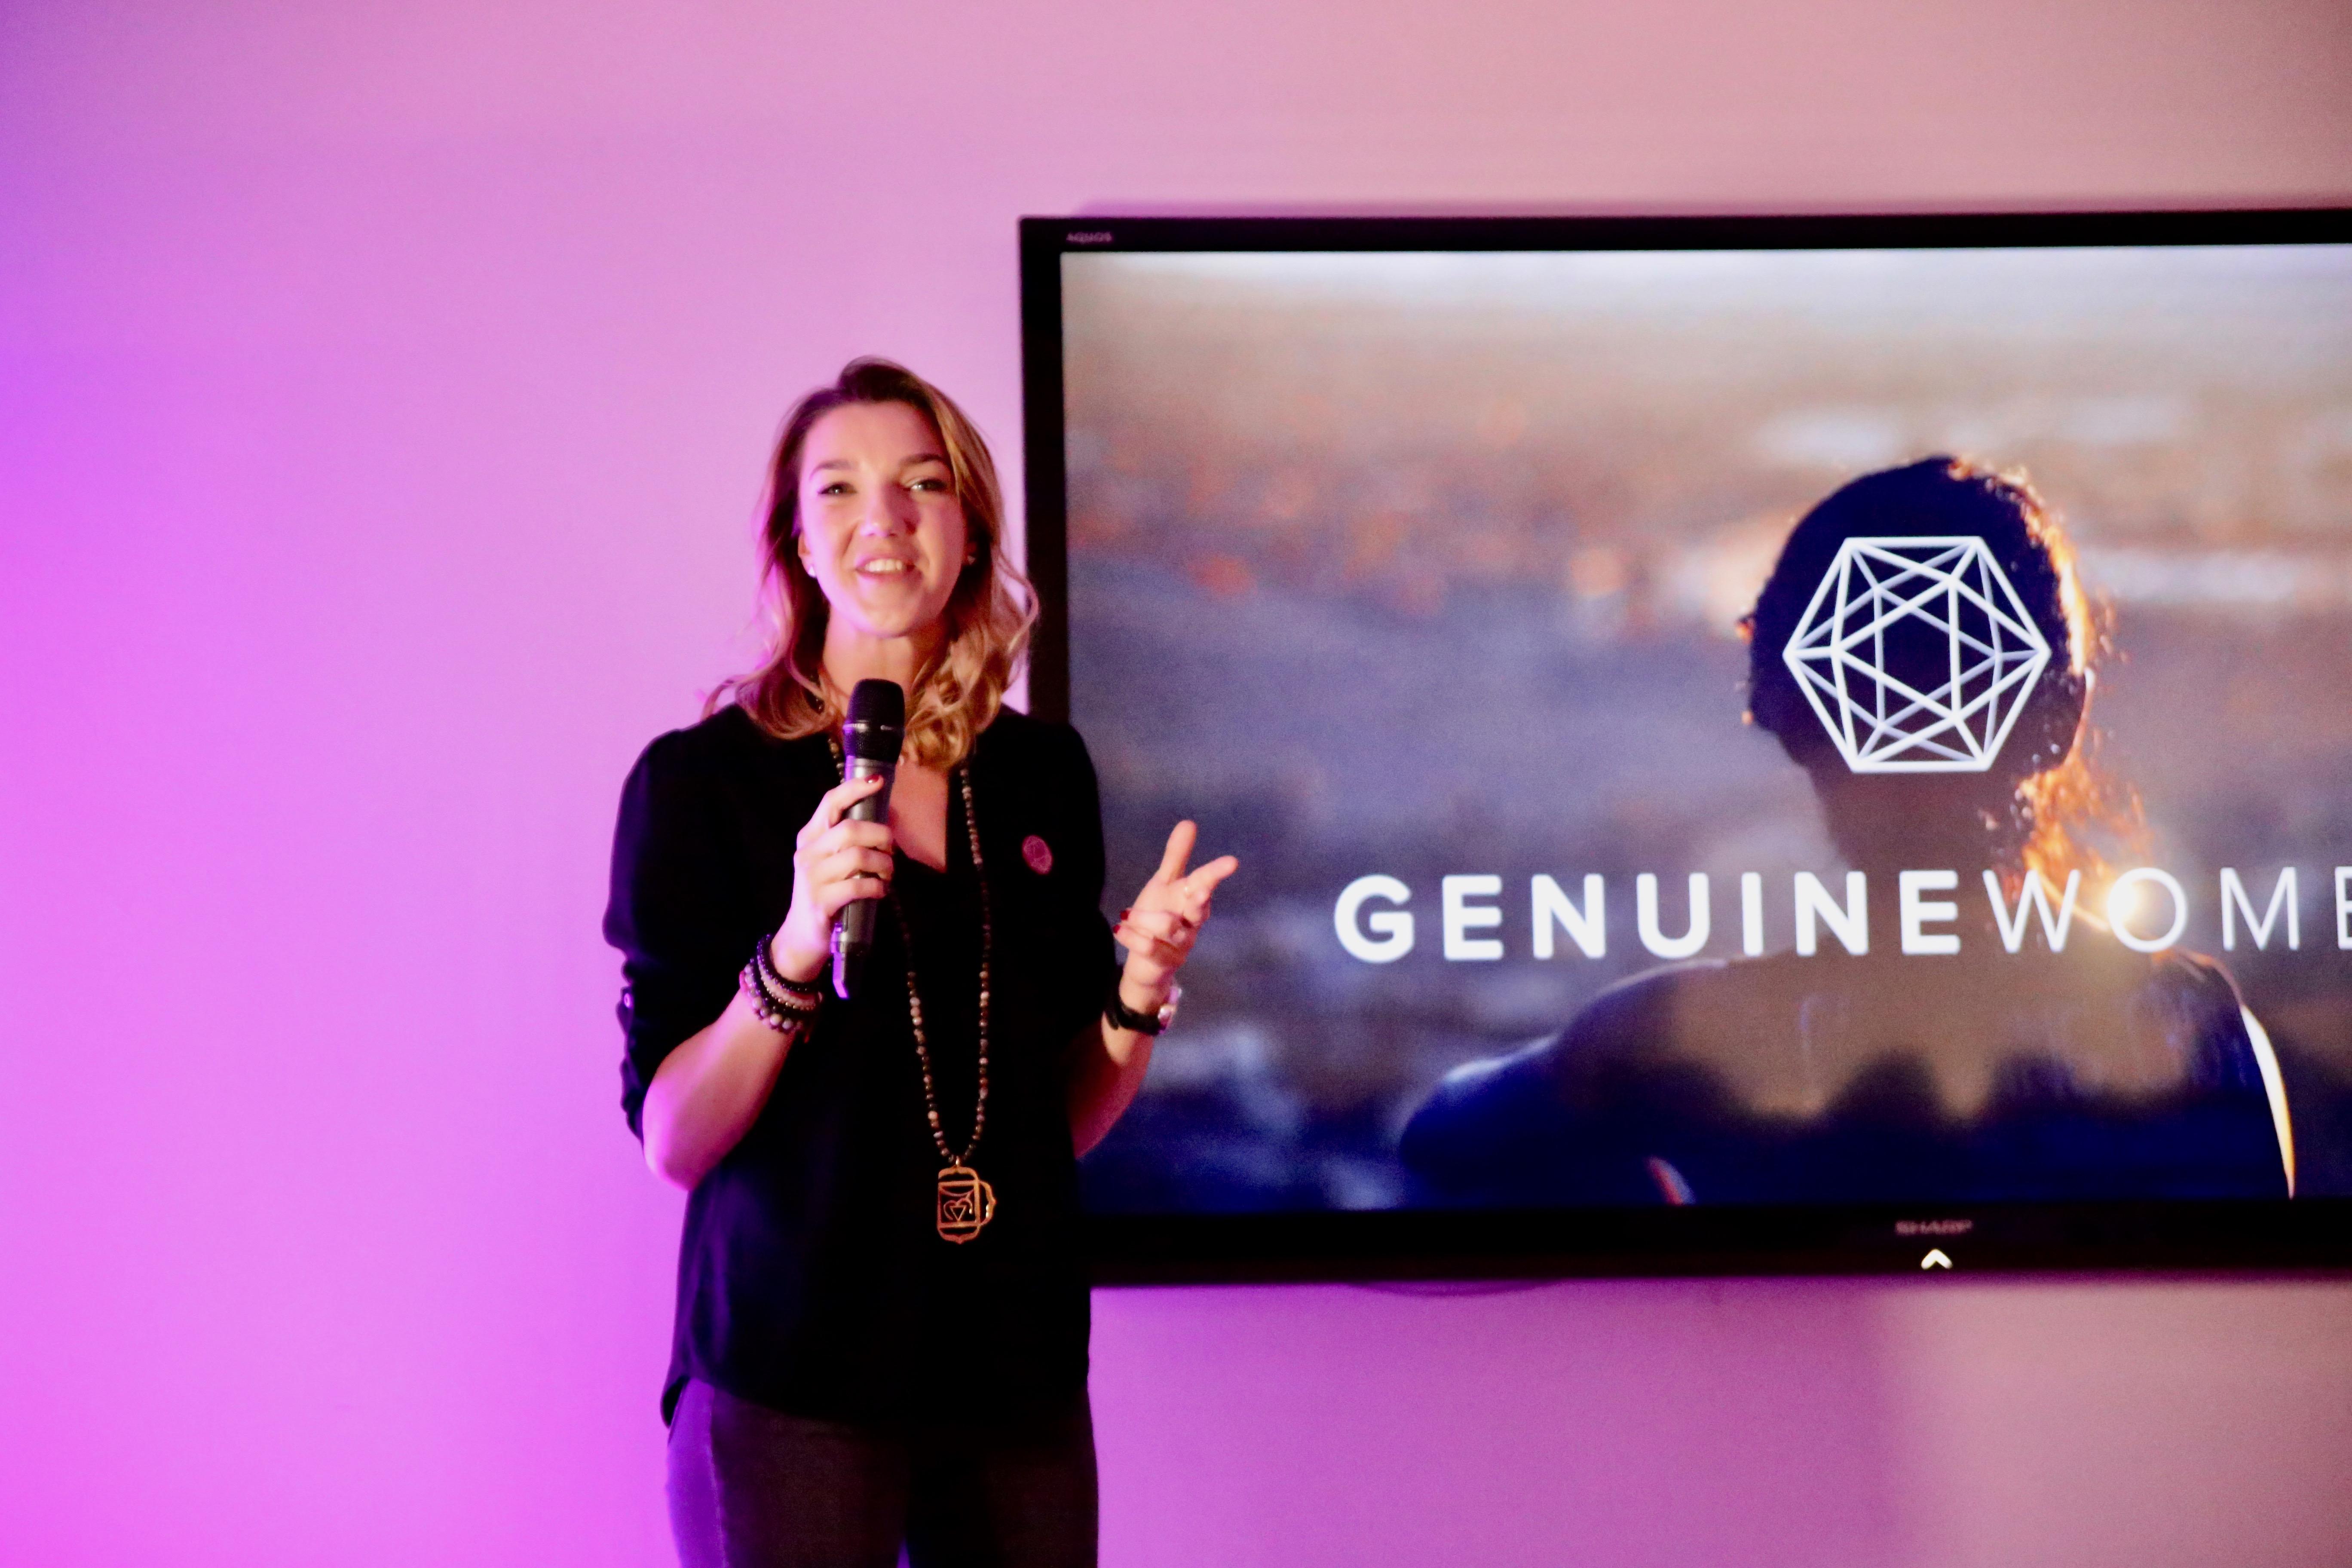 Emilie Hawlena, fondatrice de Genuine Women ©Rose Bolli